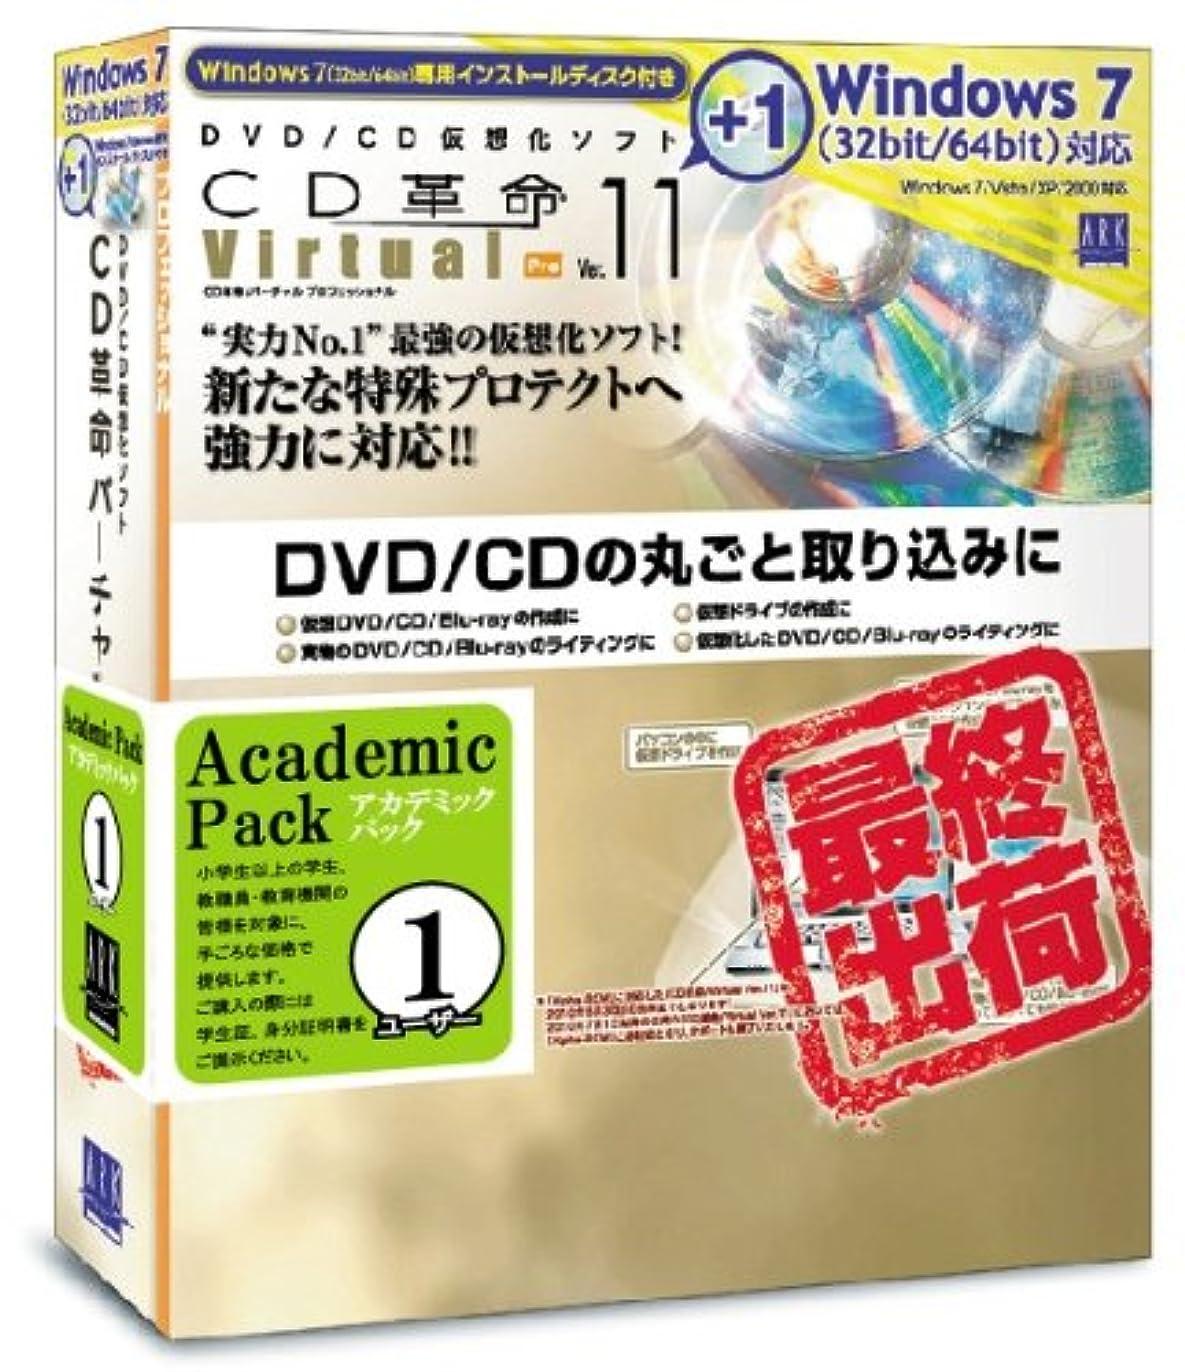 CD革命/Virtual Ver.11 for Windows7 Pro アカデミックパック1ユーザー